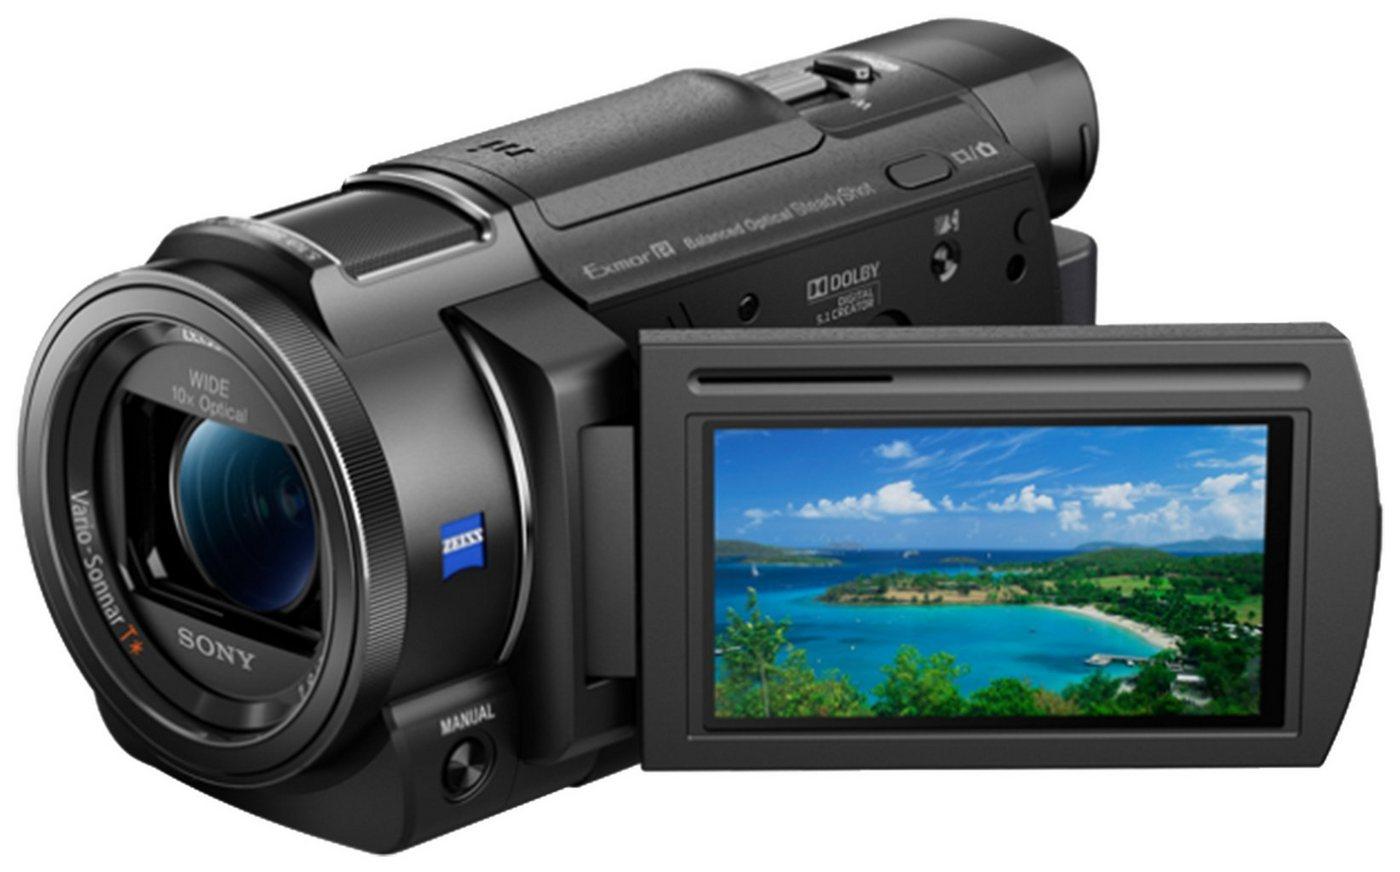 Camcorder - Sony »FDR AX33« Camcorder (4K Ultra HD, WLAN (Wi Fi), NFC, 10x opt. Zoom, My Voice Cancelling, CinemaTone, Golf Shot, Aufnahmeautomatik, Smile Shutter, fließende Zeitlupe)  - Onlineshop OTTO